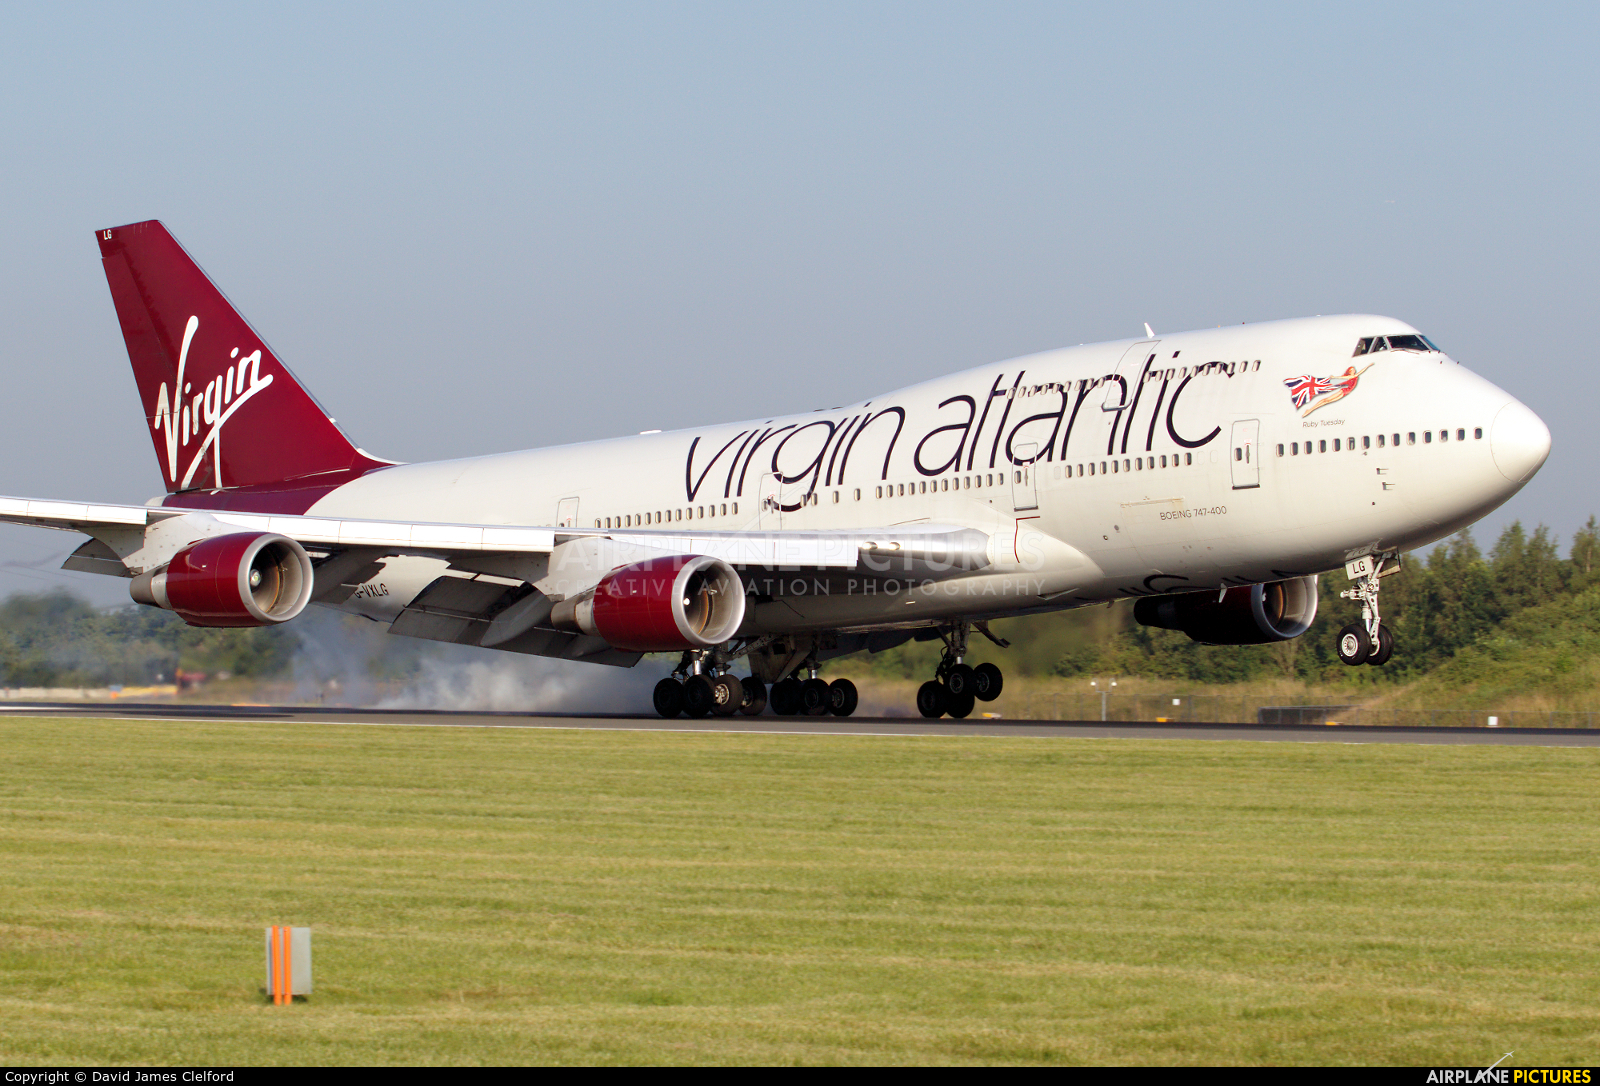 Virgin Atlantic G-VXLG aircraft at Manchester